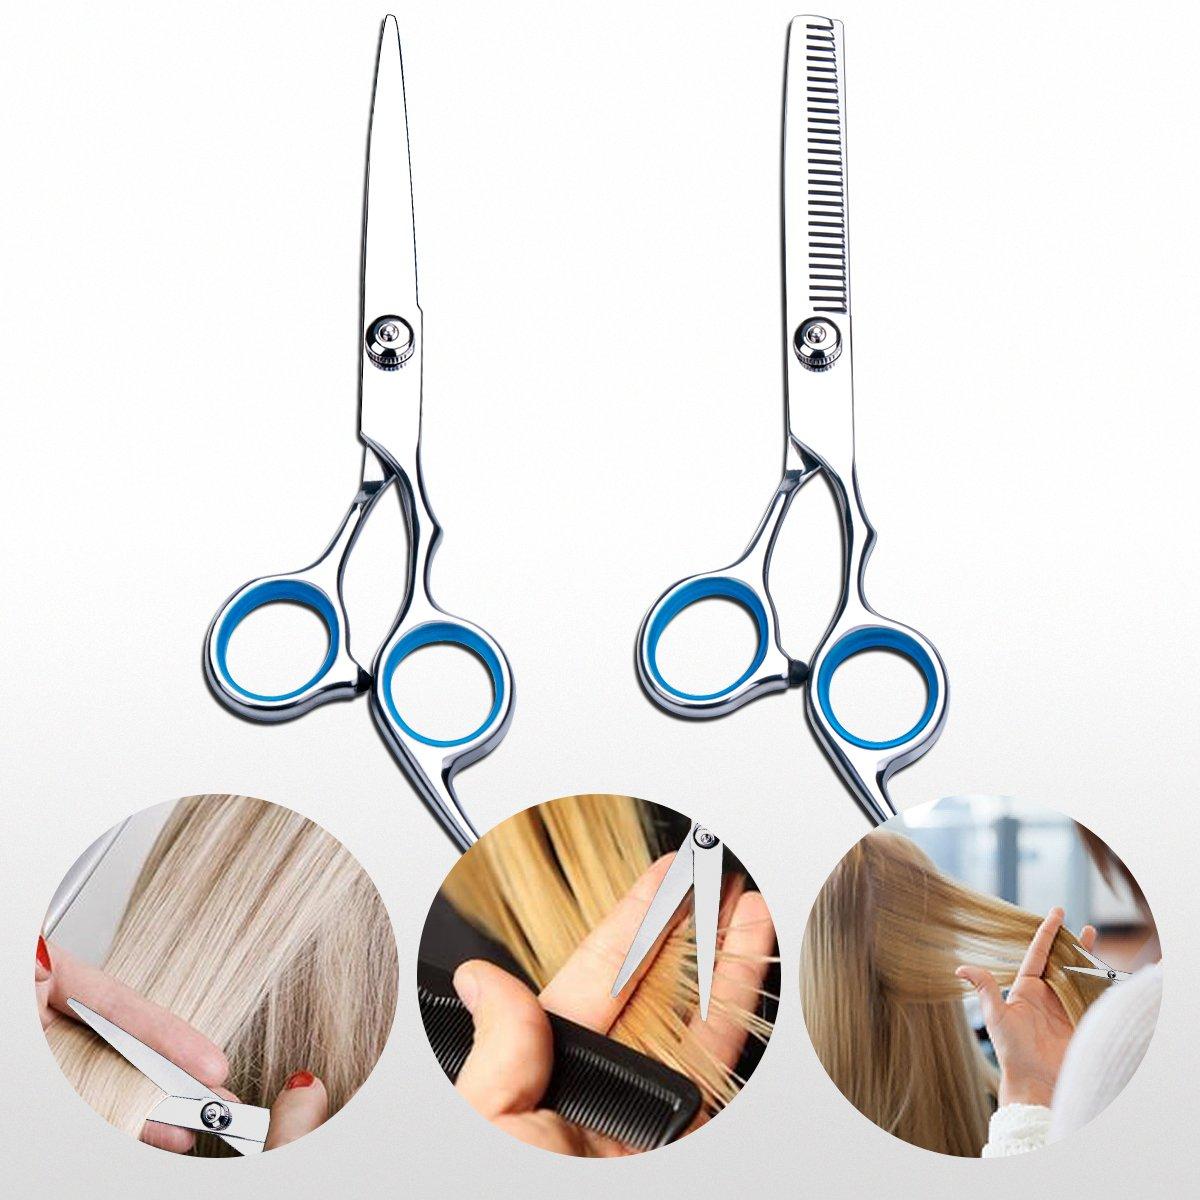 Barber Hair Scissors Set, Hair Cutting Shears Scissors Professional by Petutu (Image #6)